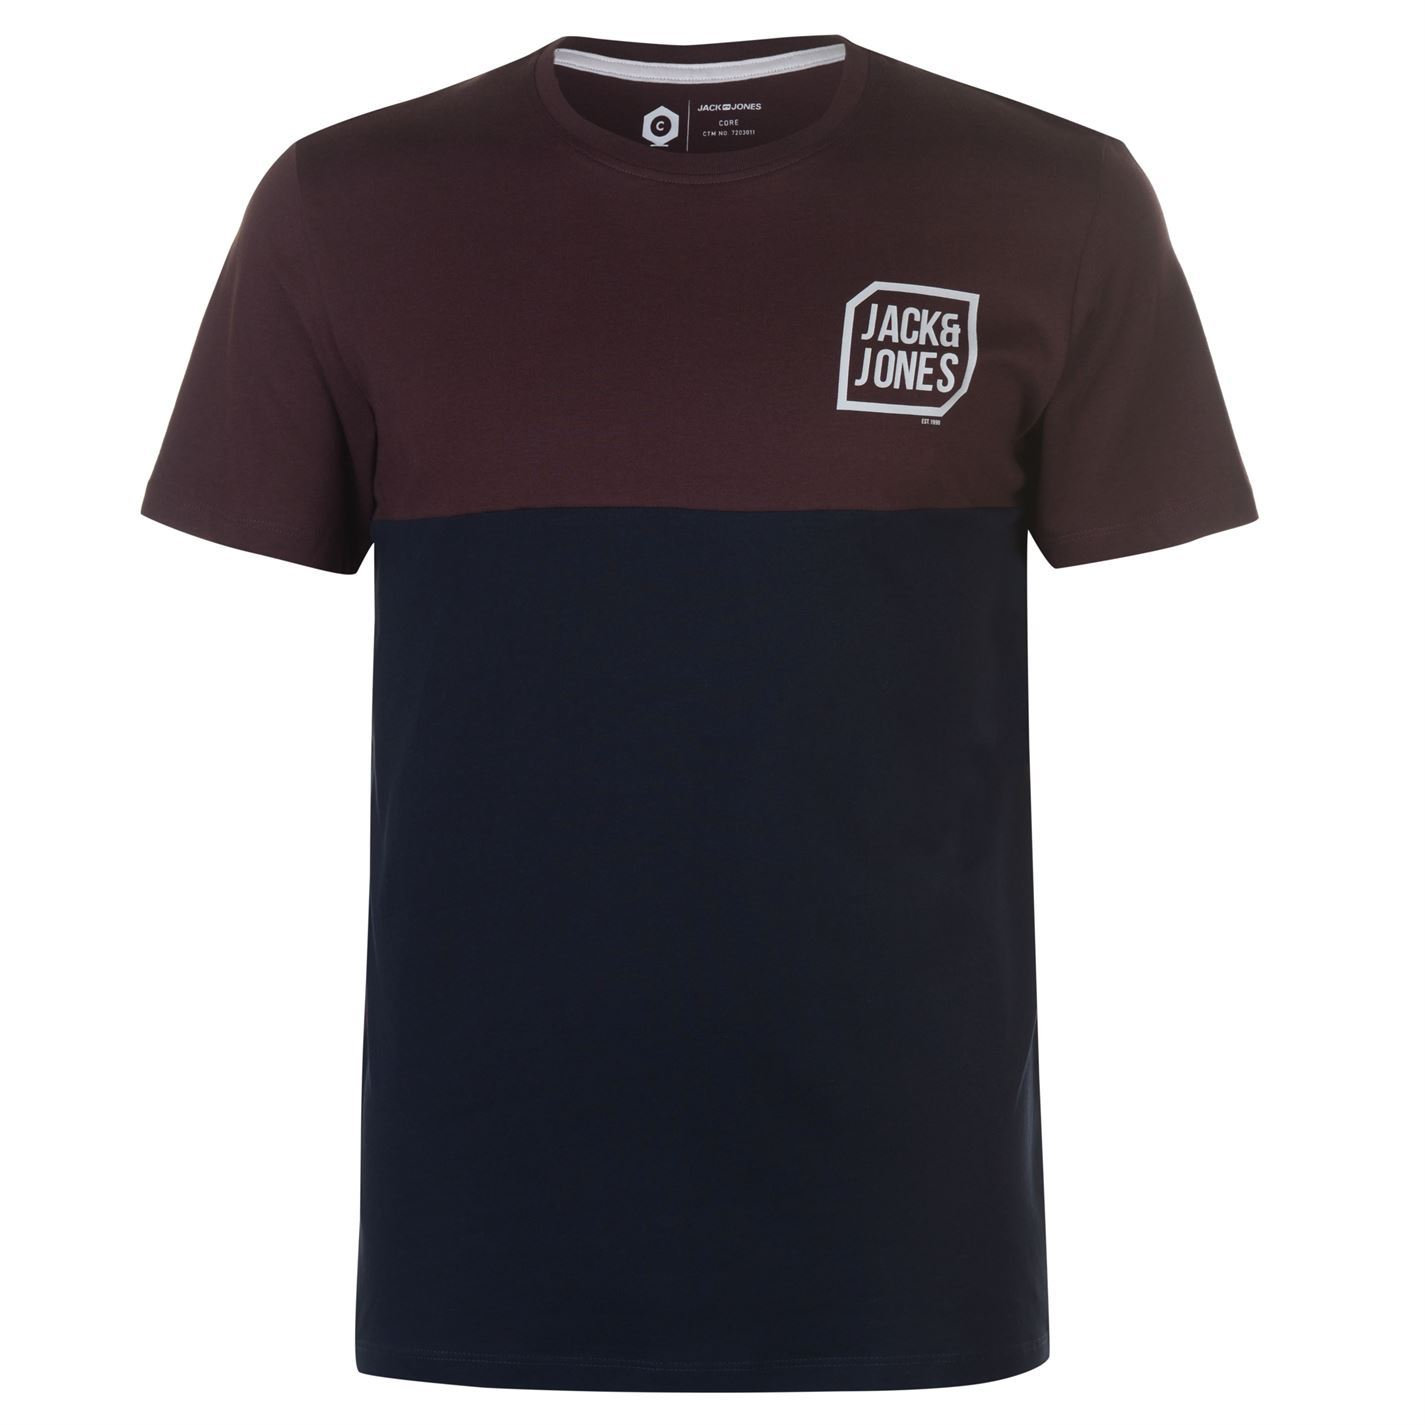 Jack-and-Jones-Core-Tern-T-Shirt-Mens-Tee-Shirt-Top thumbnail 9